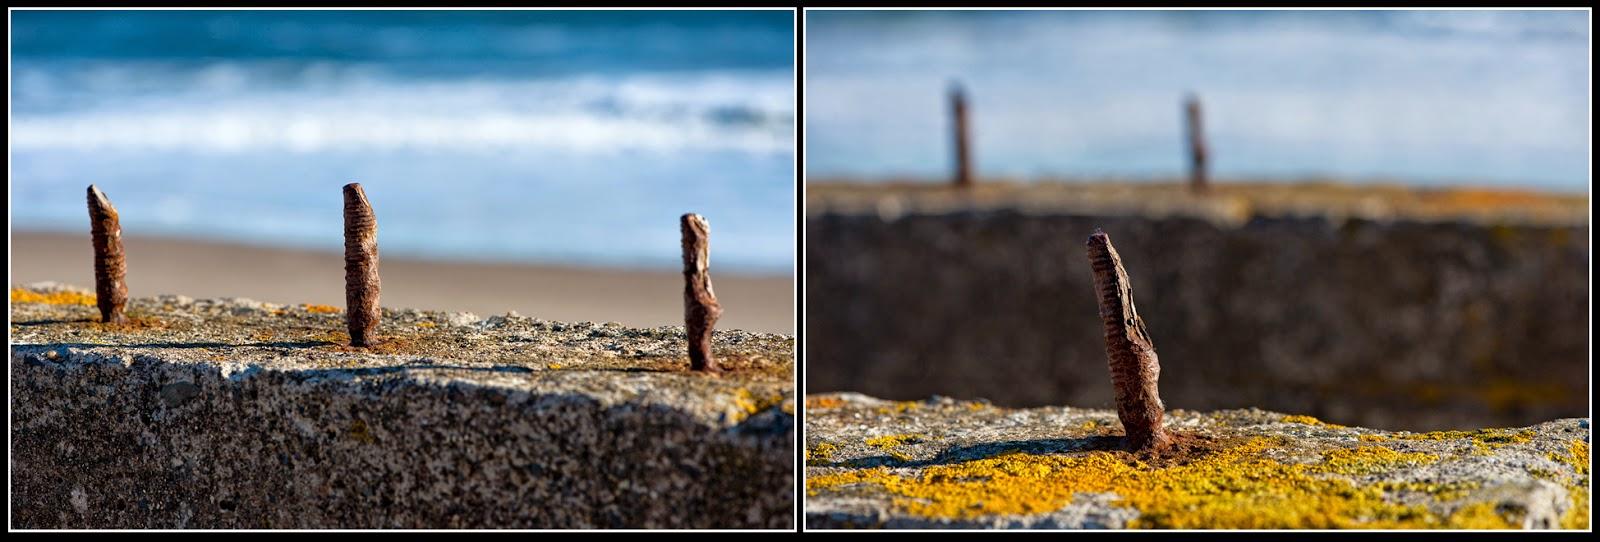 Nova Scotia; Hirtle's Beach